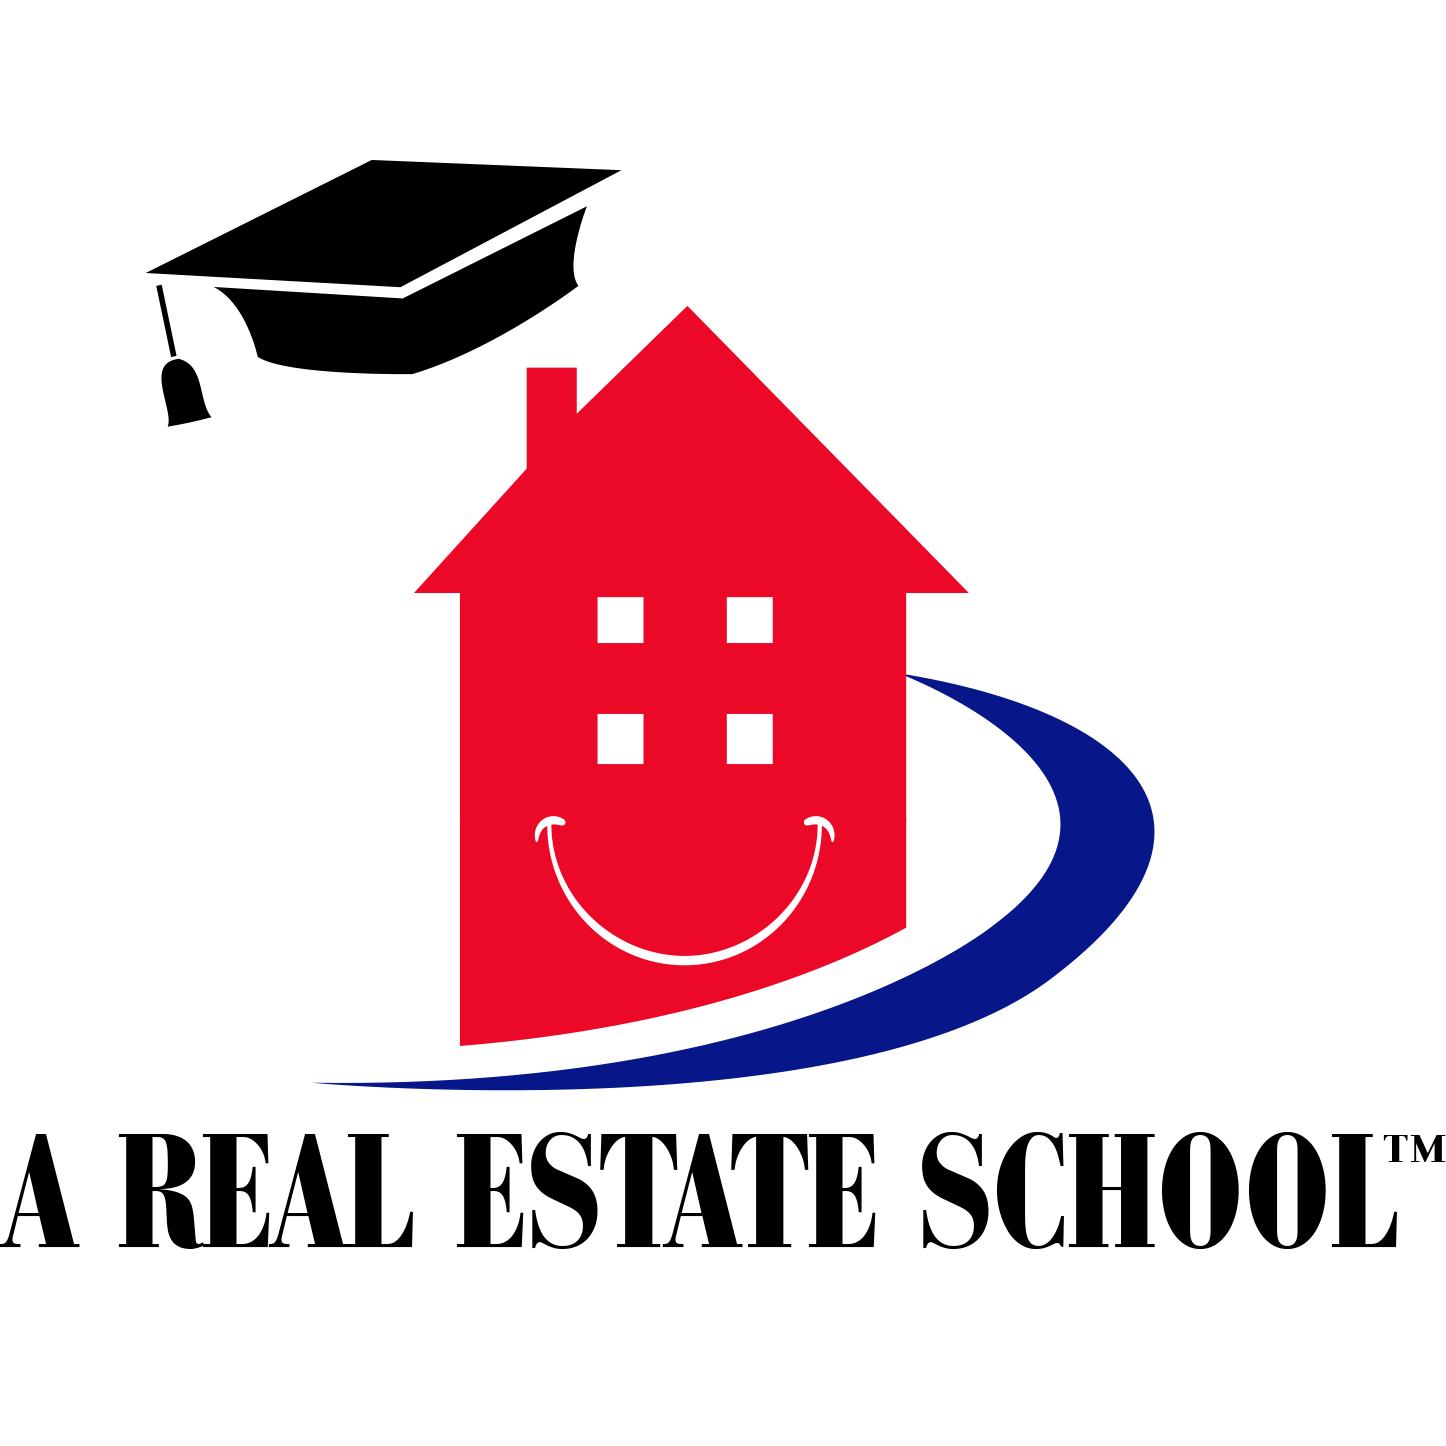 A Real Estate School